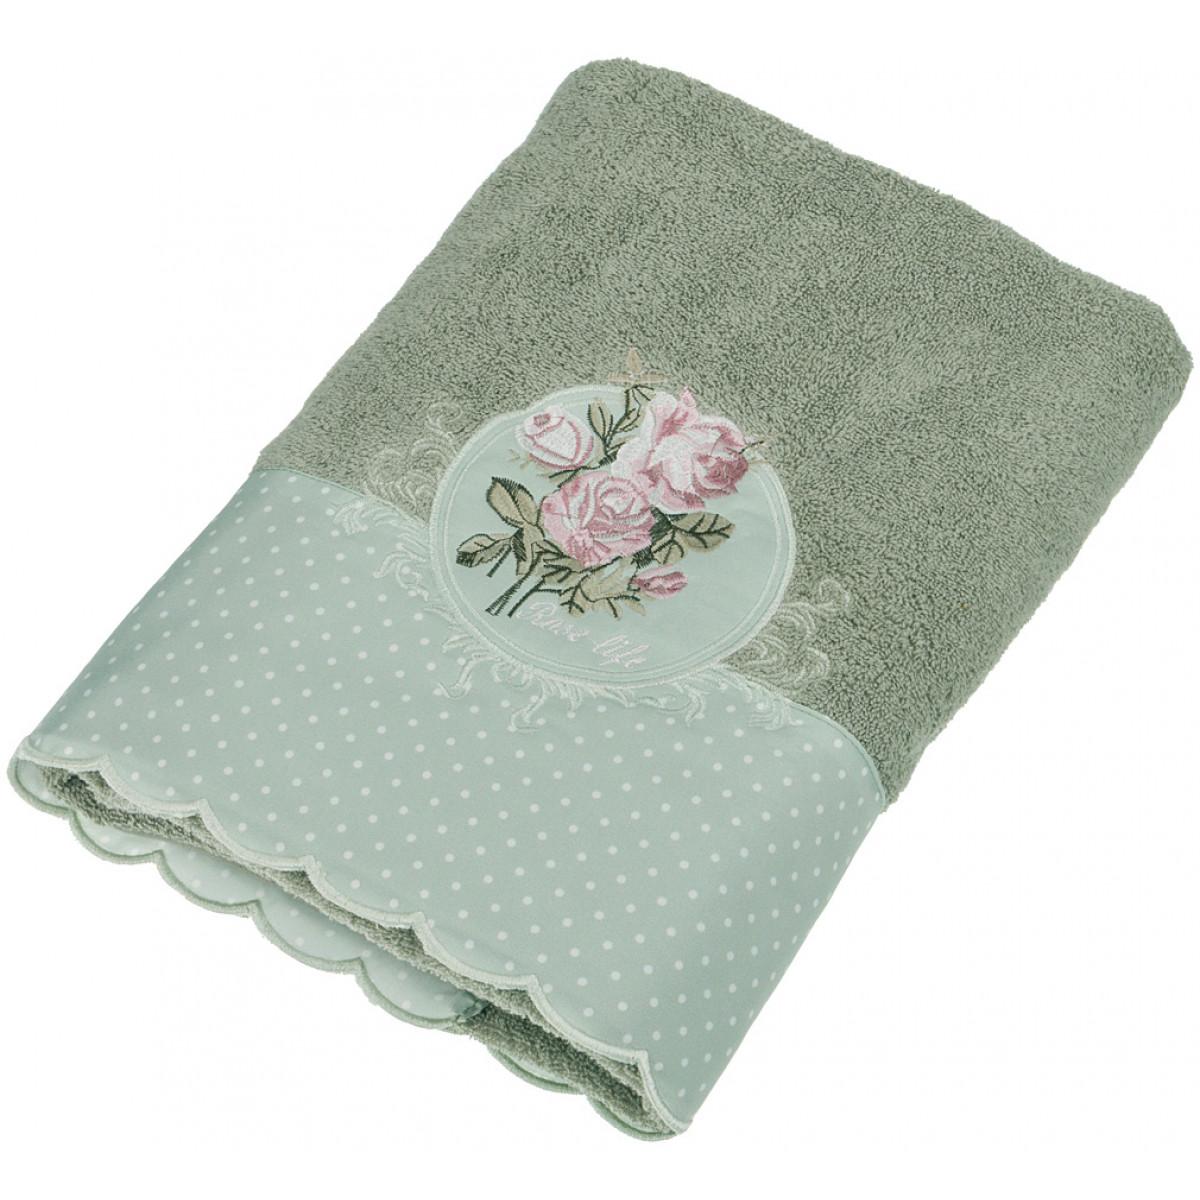 Полотенца Santalino Полотенце Maybelle  (70х140 см) полотенца santalino полотенце shulamite 40х70 см